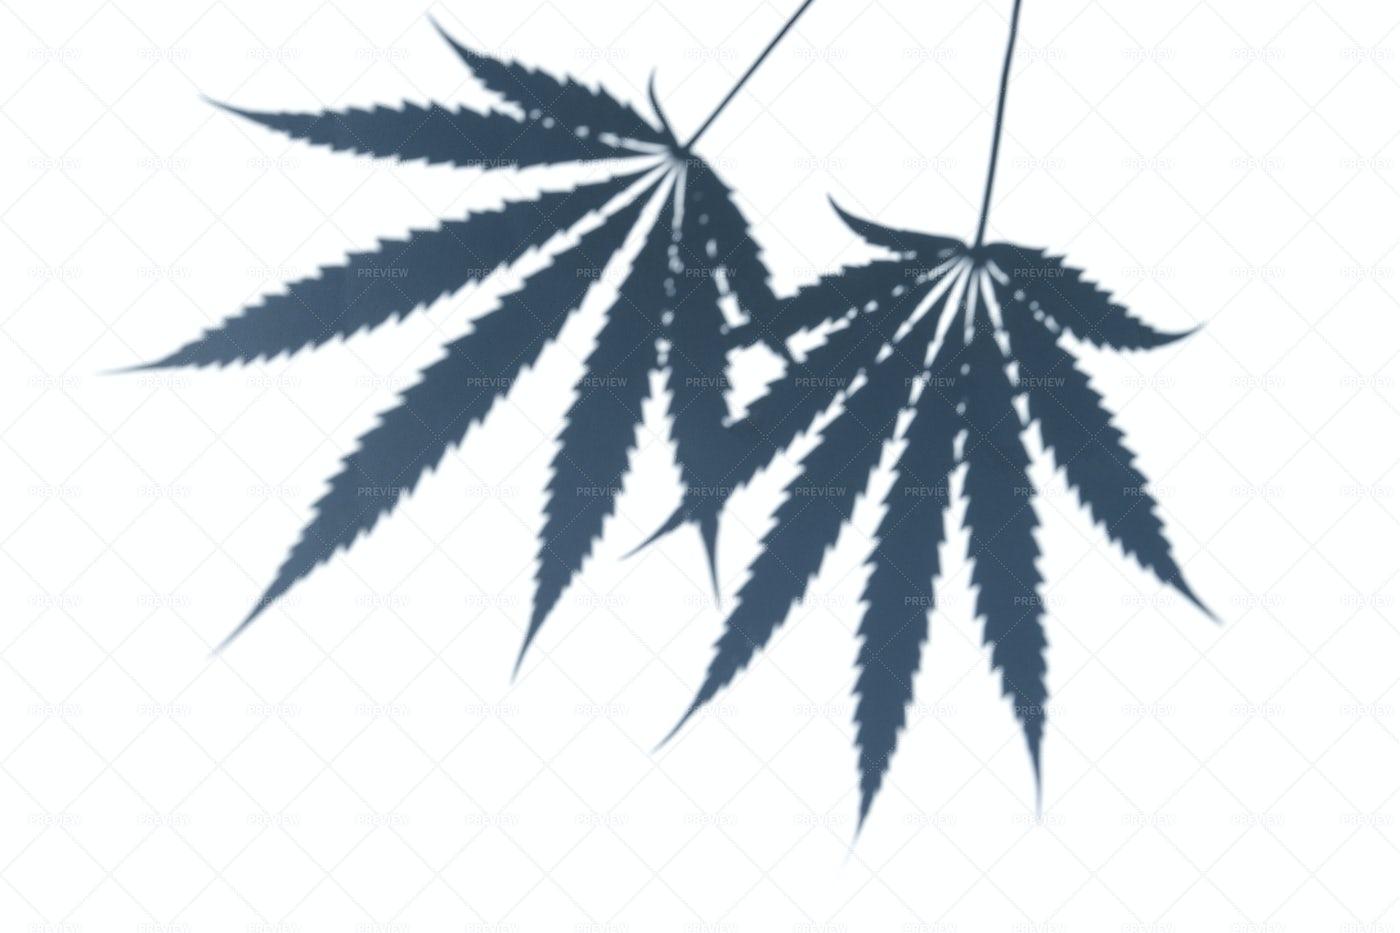 Marijuana Leaves: Stock Photos